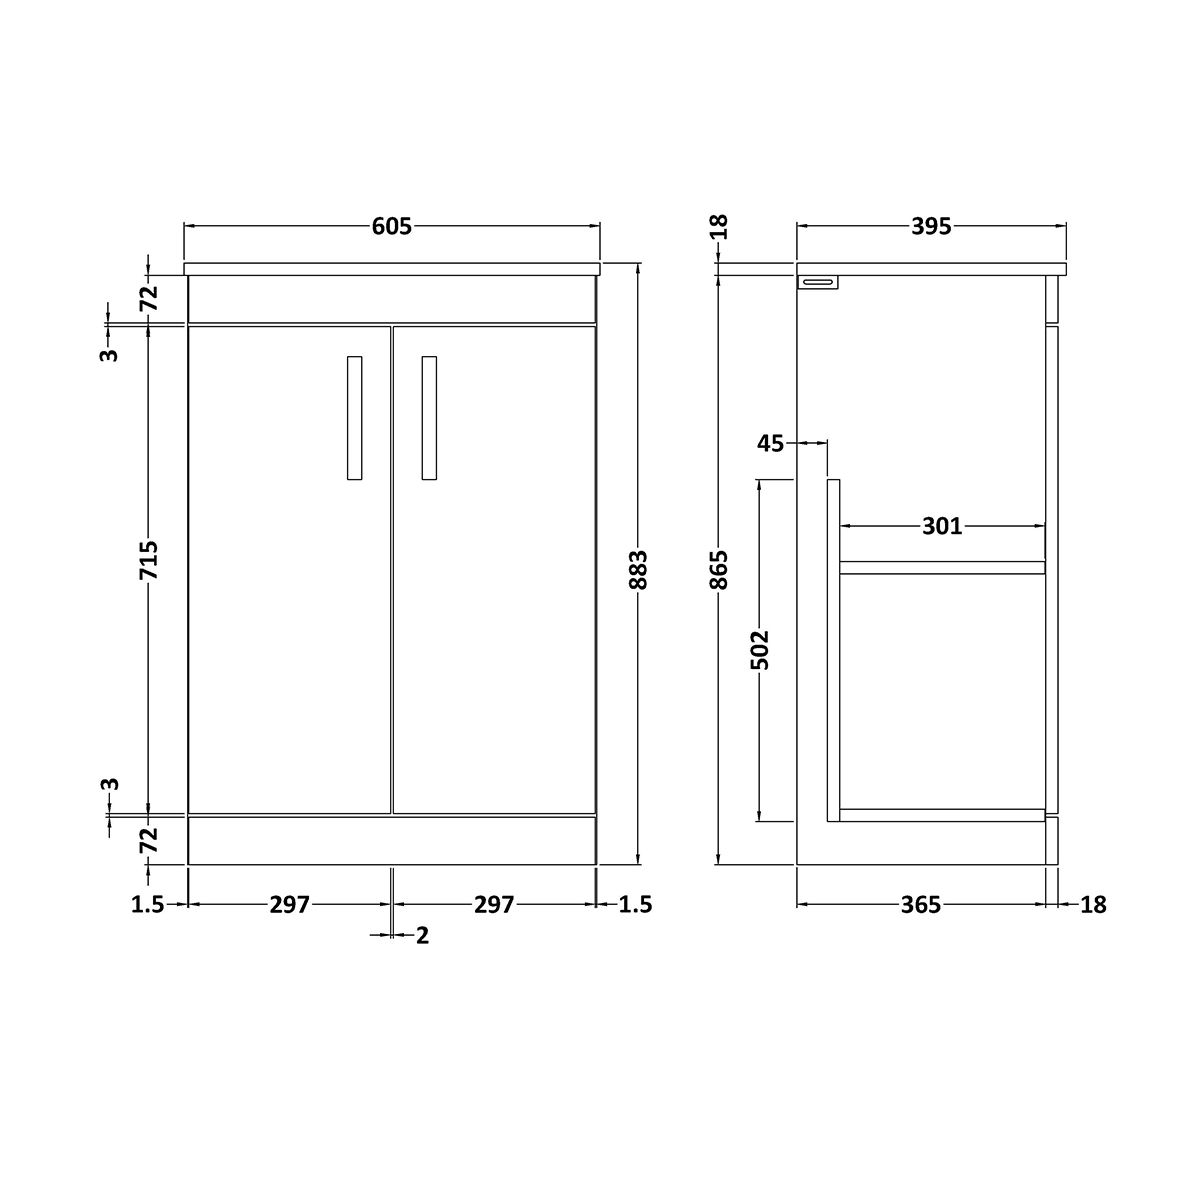 Nuie Athena Gloss Grey 2 Door Floor Standing Unit 600mm with Minimalist Basin Dimension